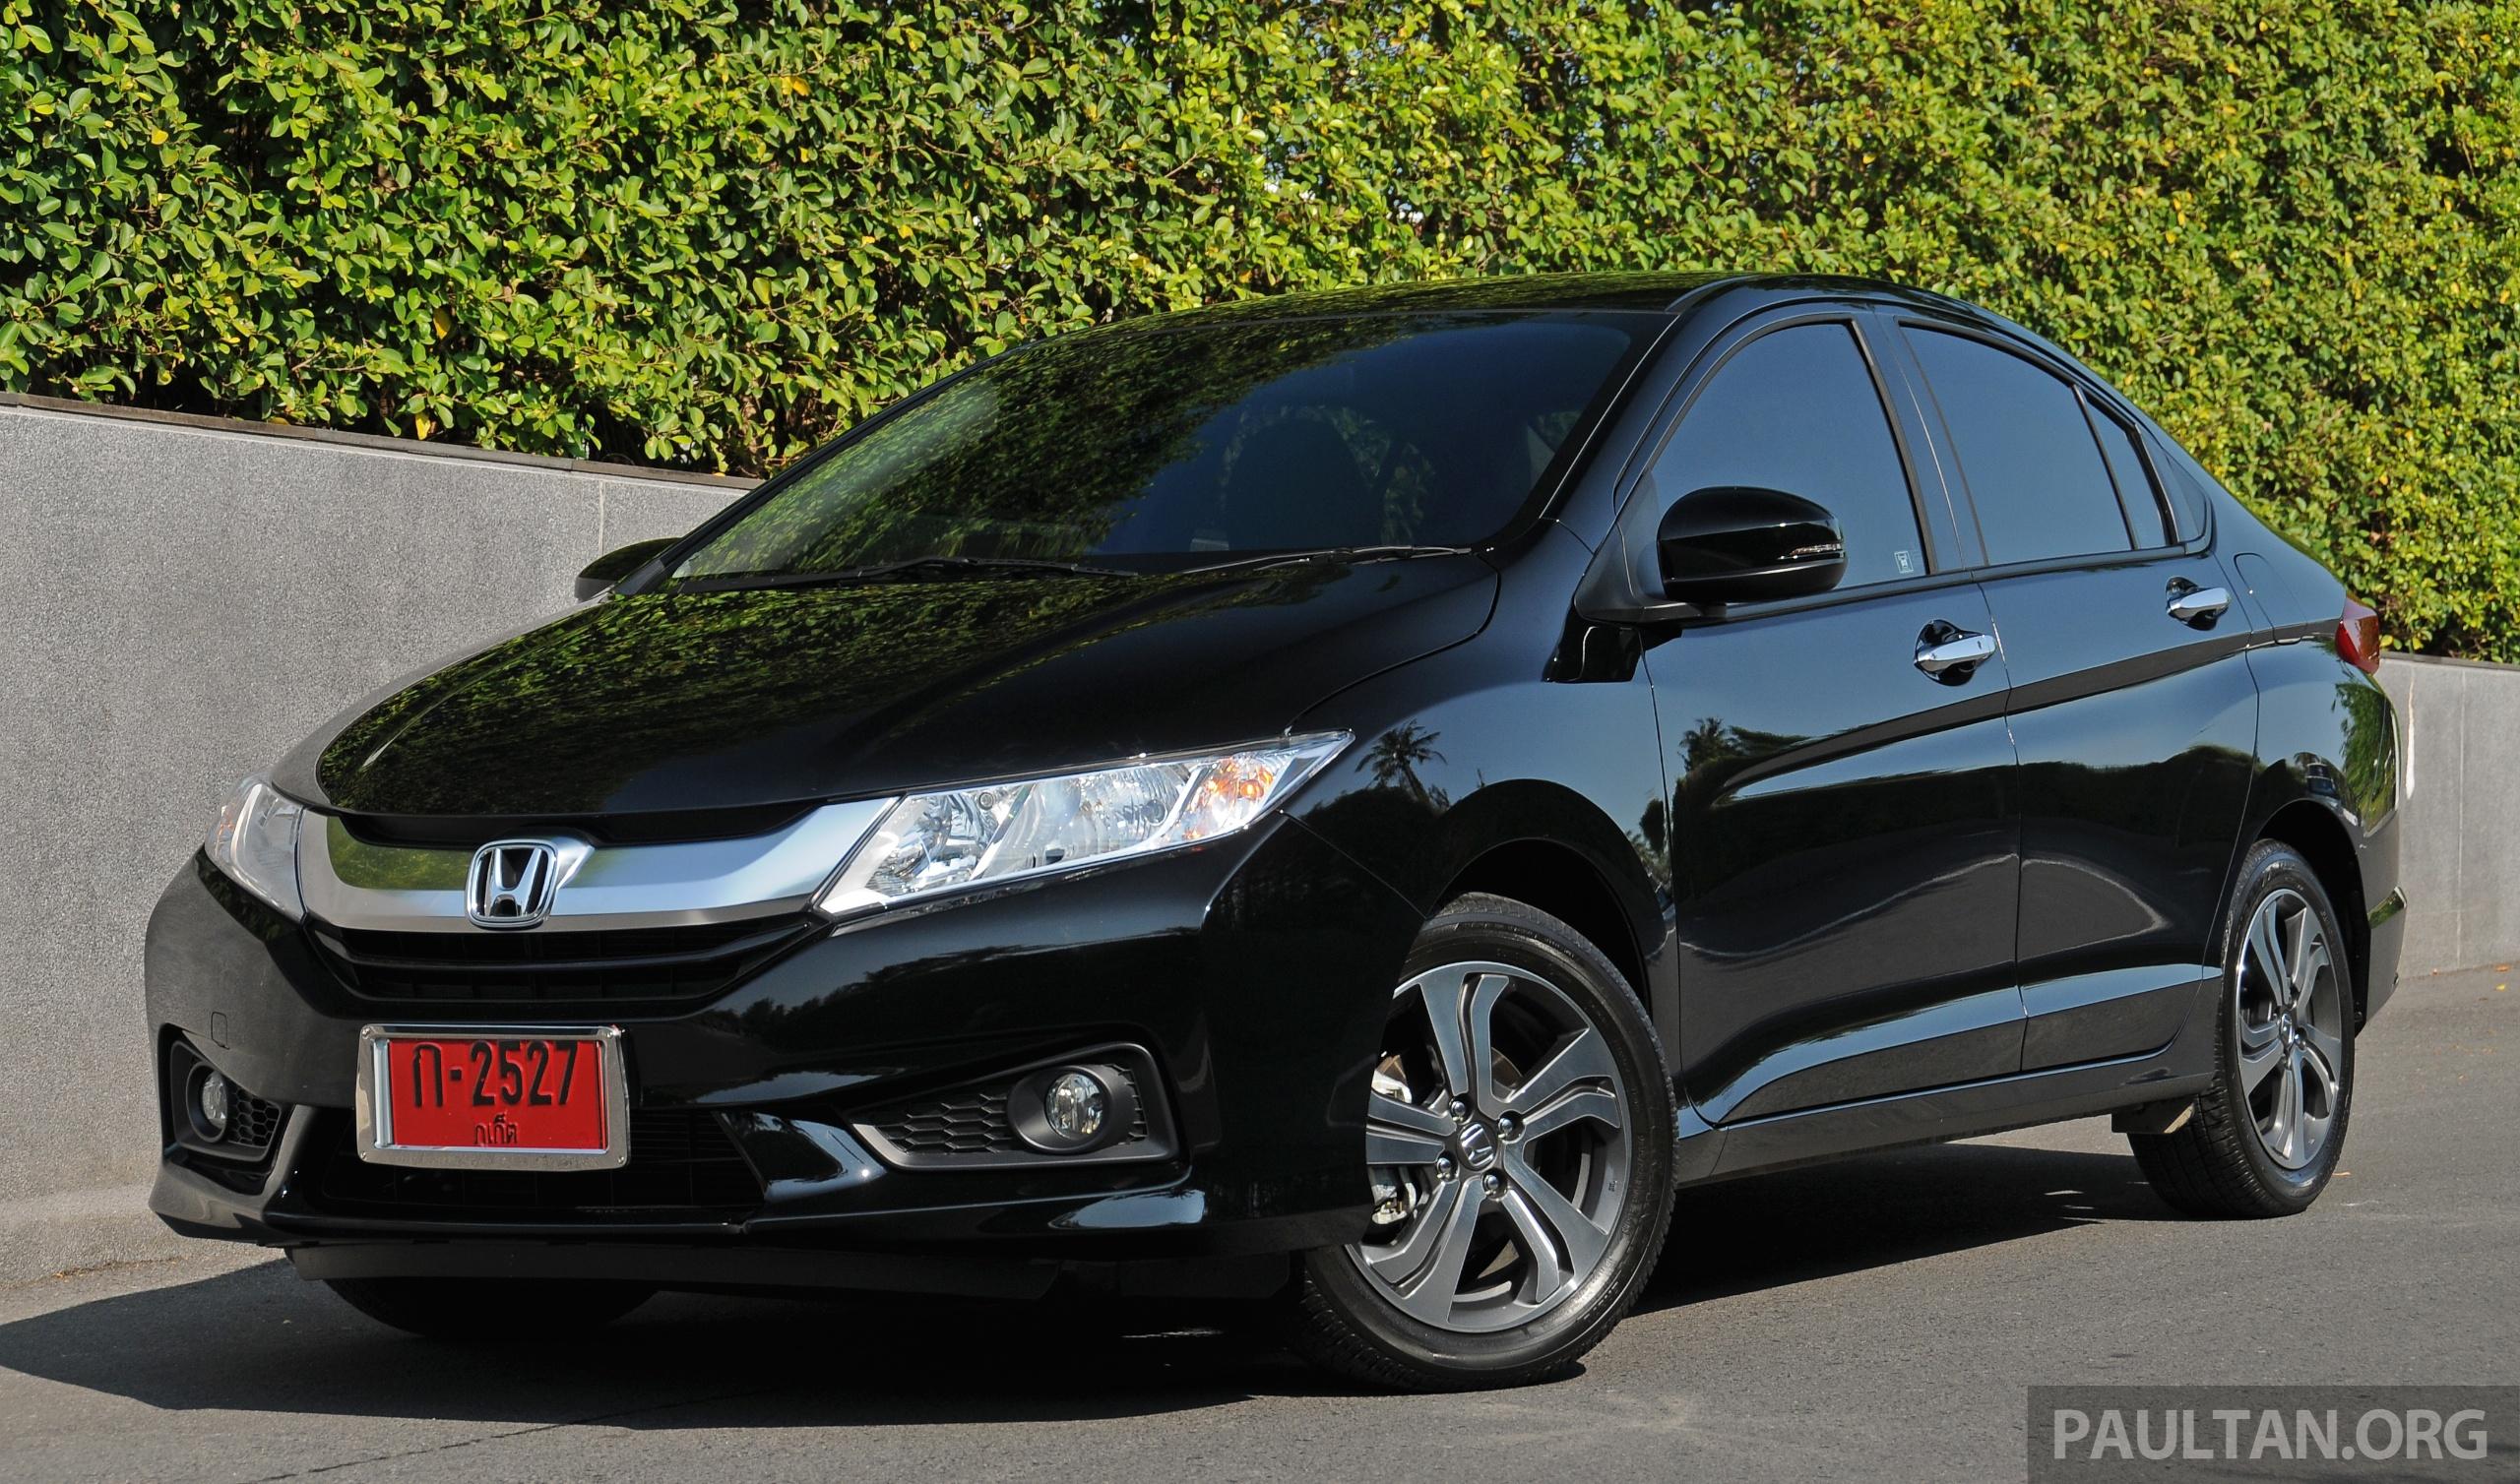 DRIVEN: 2014 Honda City i-VTEC previewed in Phuket Paul ...